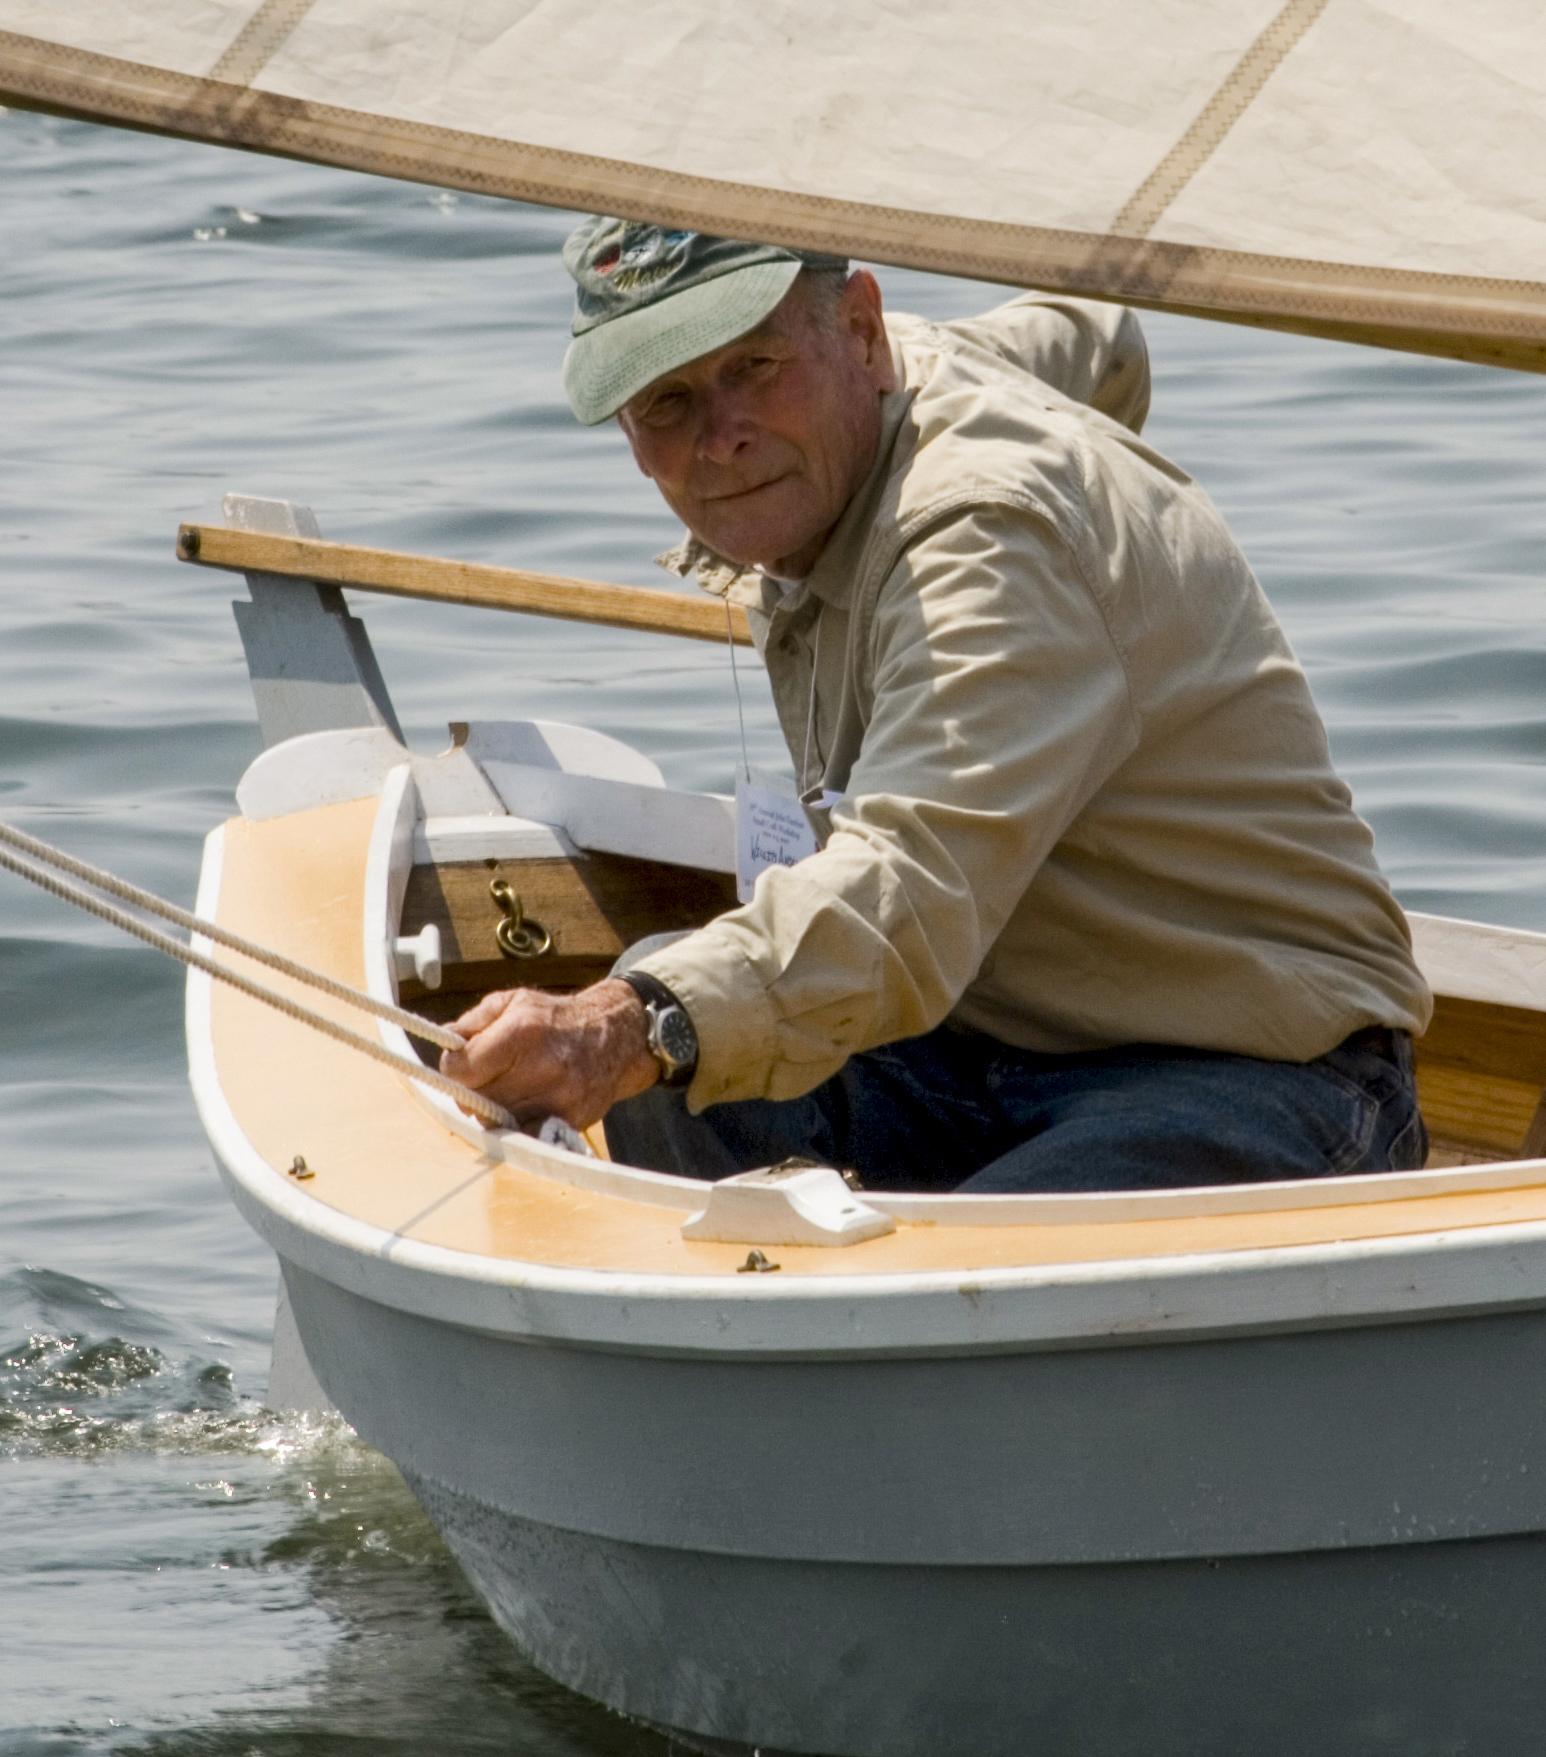 Willits D Ansel A True Renaissance Man Dies Hear The Boat Sing